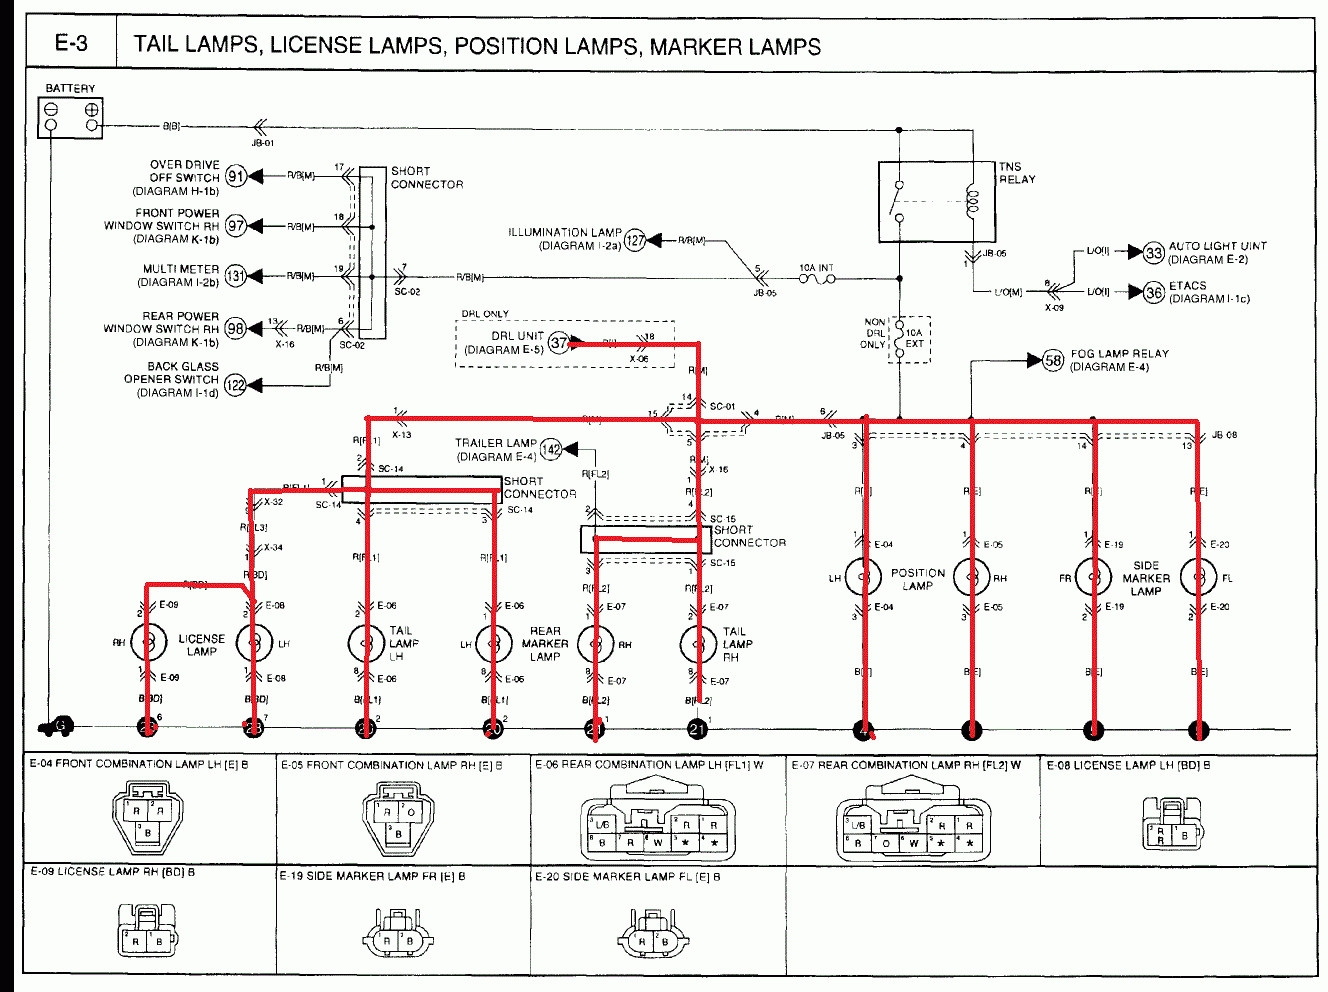 2002 Kia Spectra Fuse Box Diagram | schematic and wiring ...